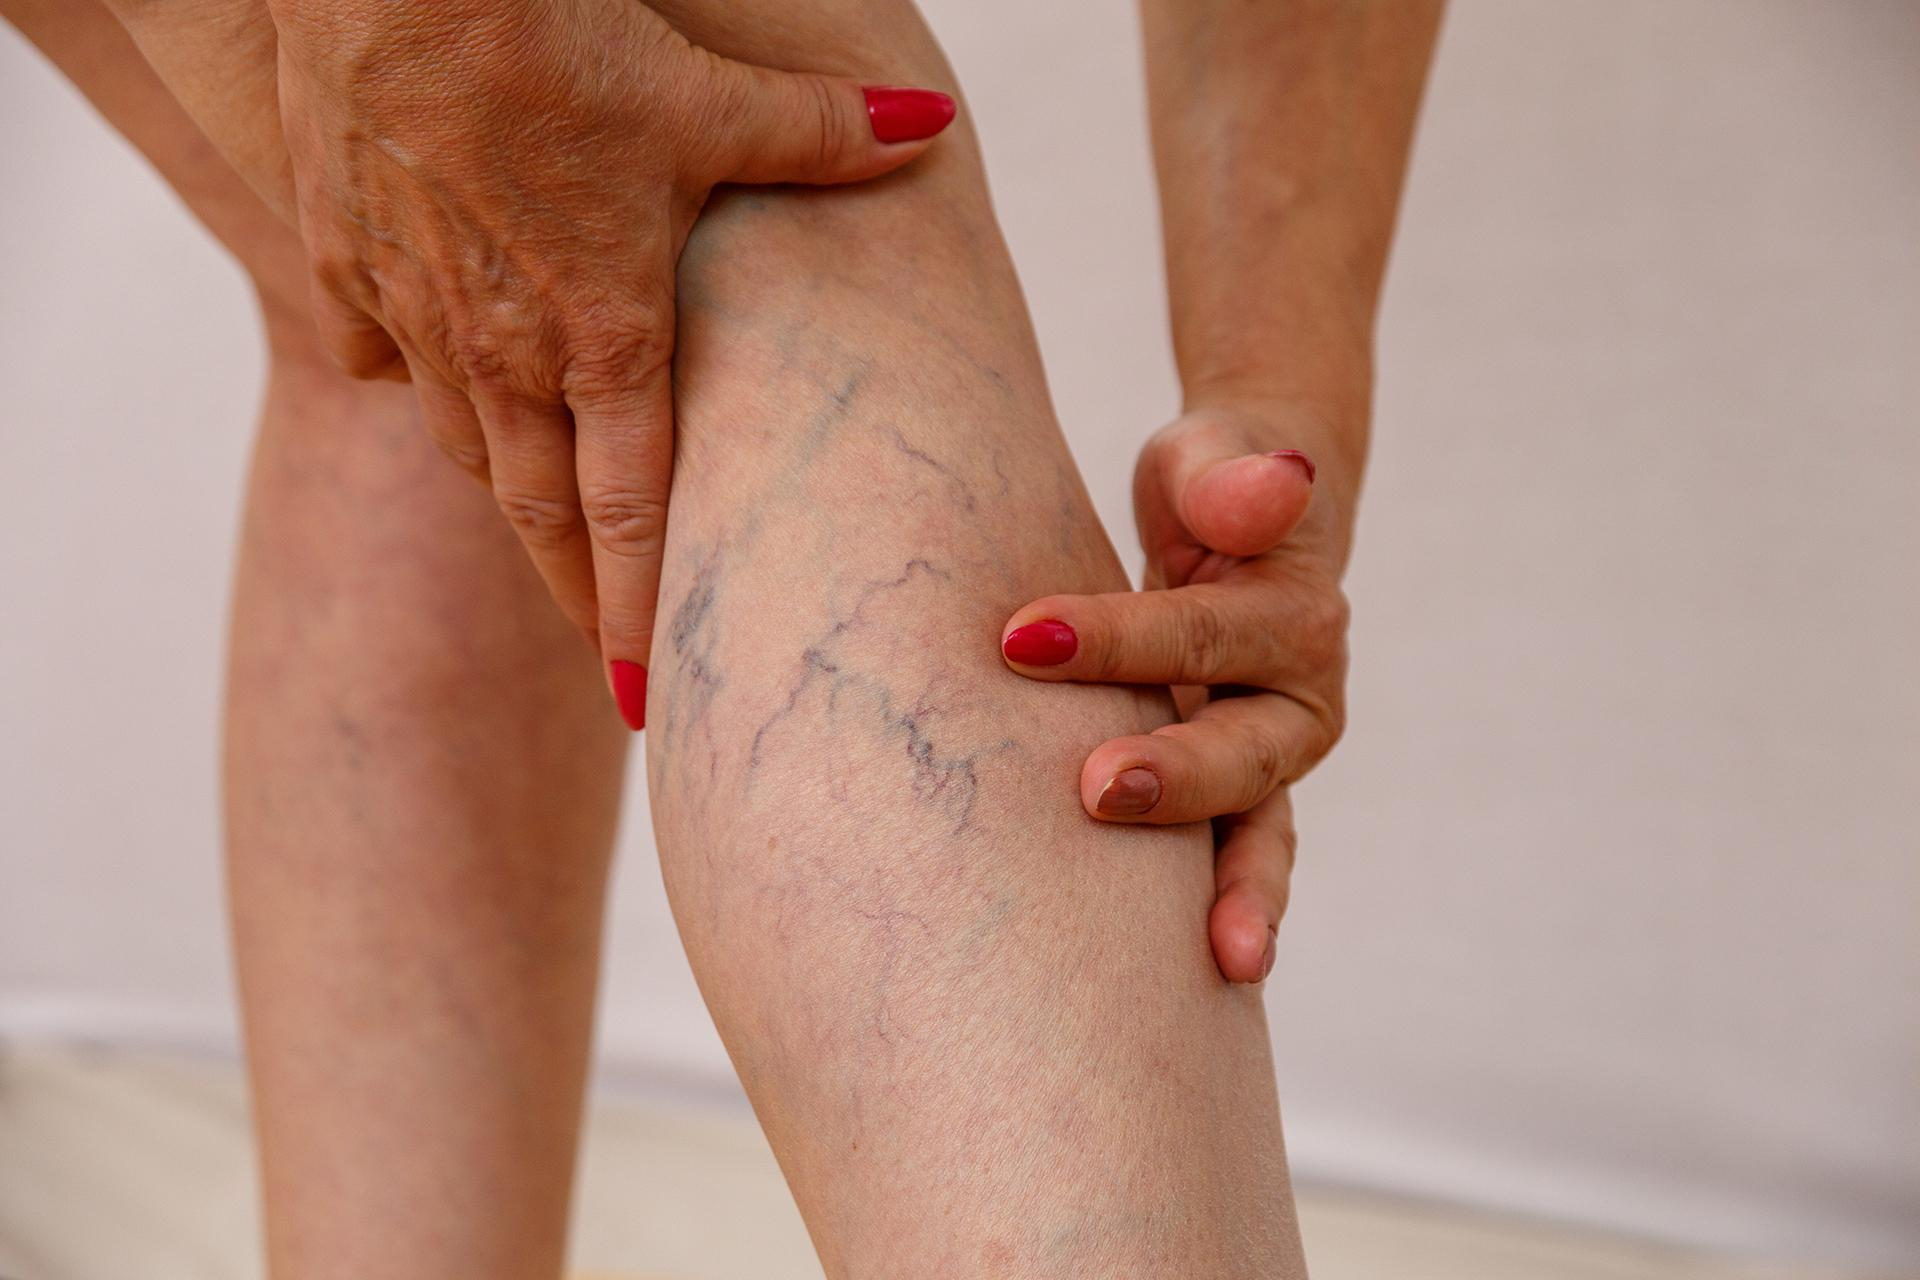 vascular-issues-requiring-leg-pain-doctor-Manhattan-Beach